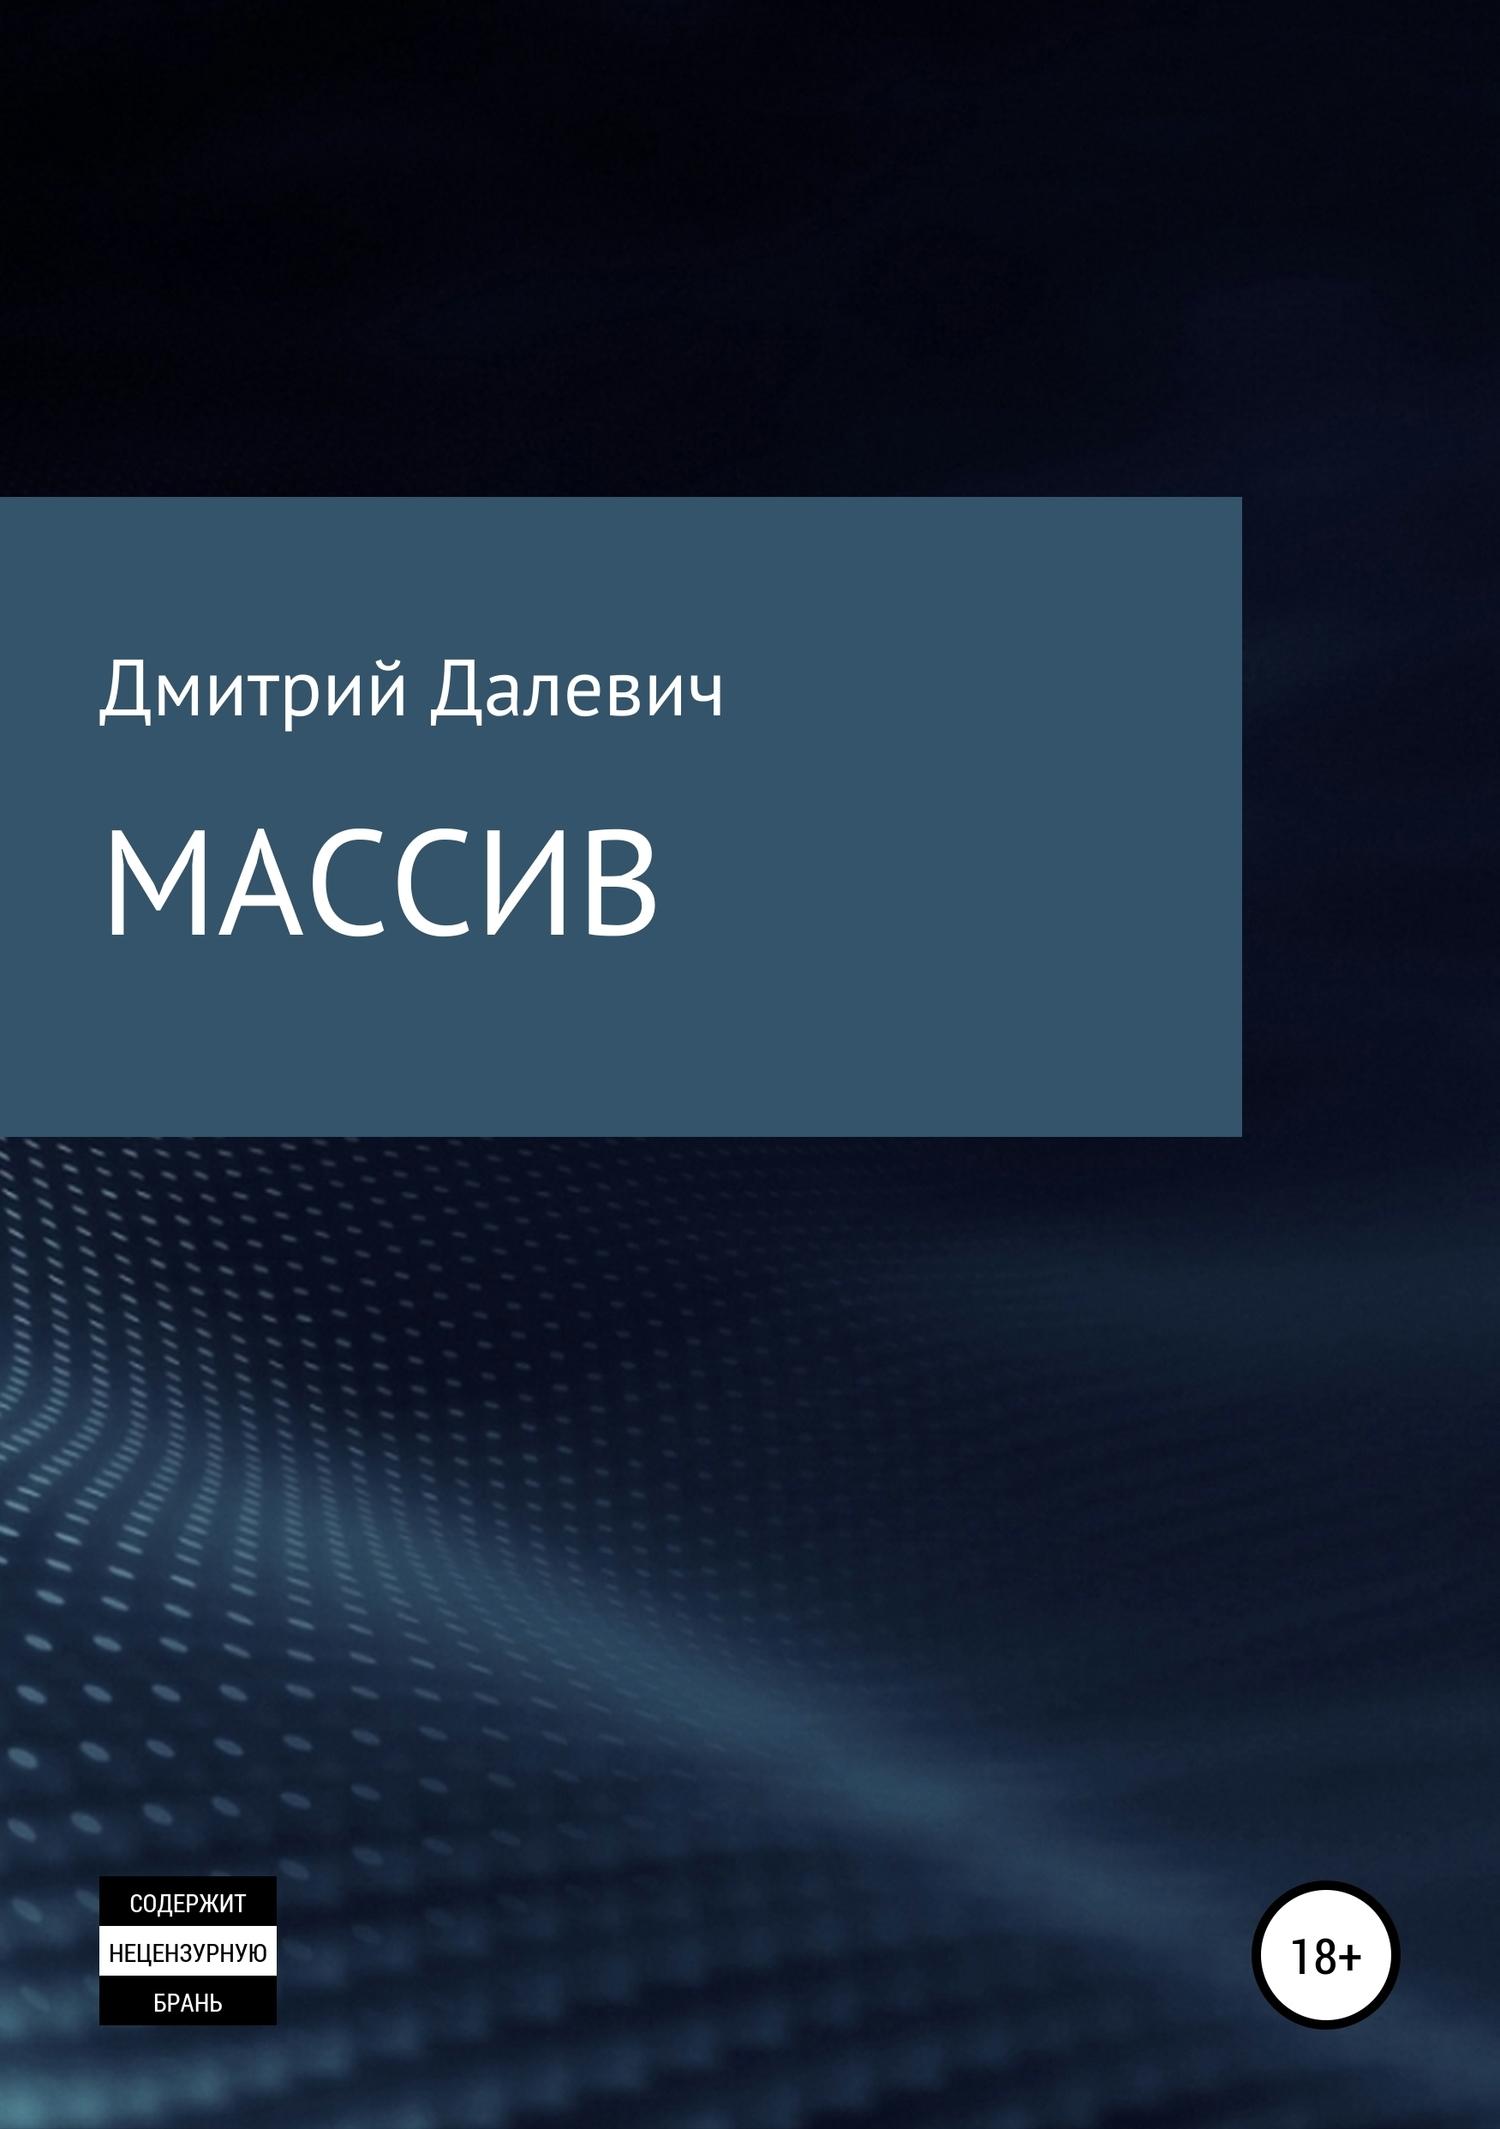 Дмитрий Далевич - Массив